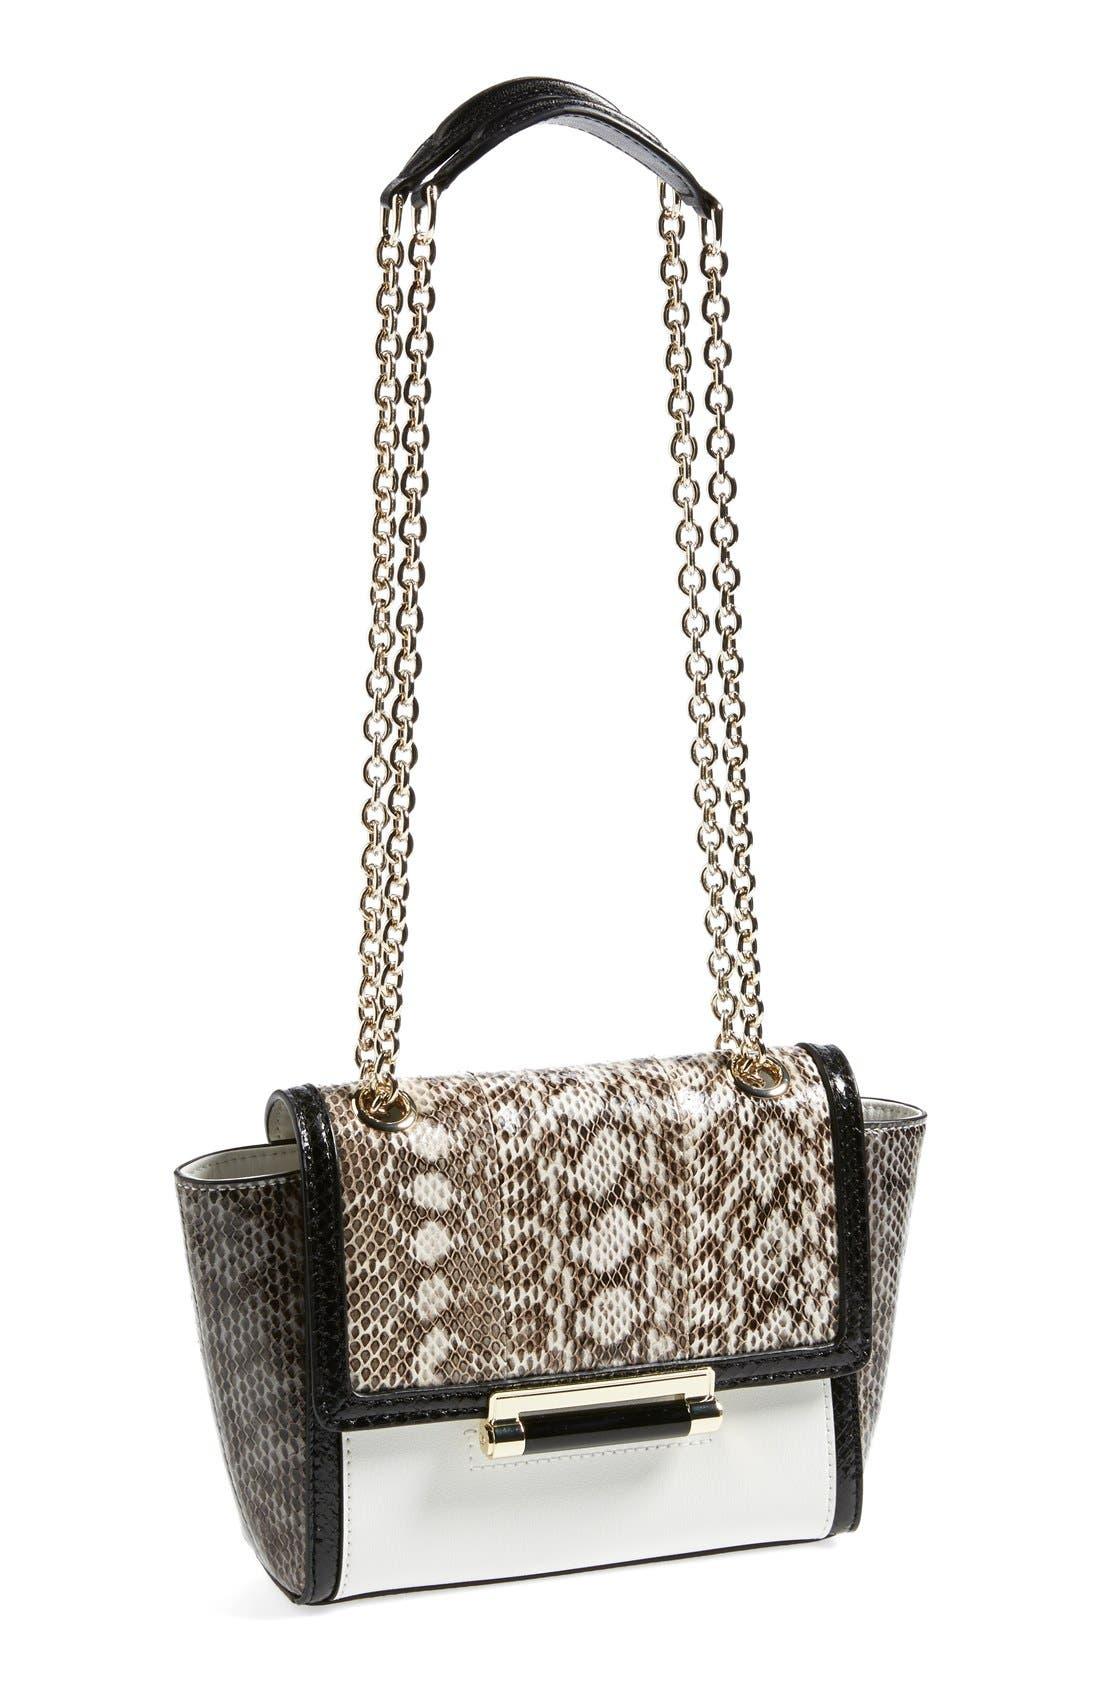 Alternate Image 1 Selected - Diane Von Furstenberg '440 - Mini' Genuine Snakeskin & Leather Crossbody Bag